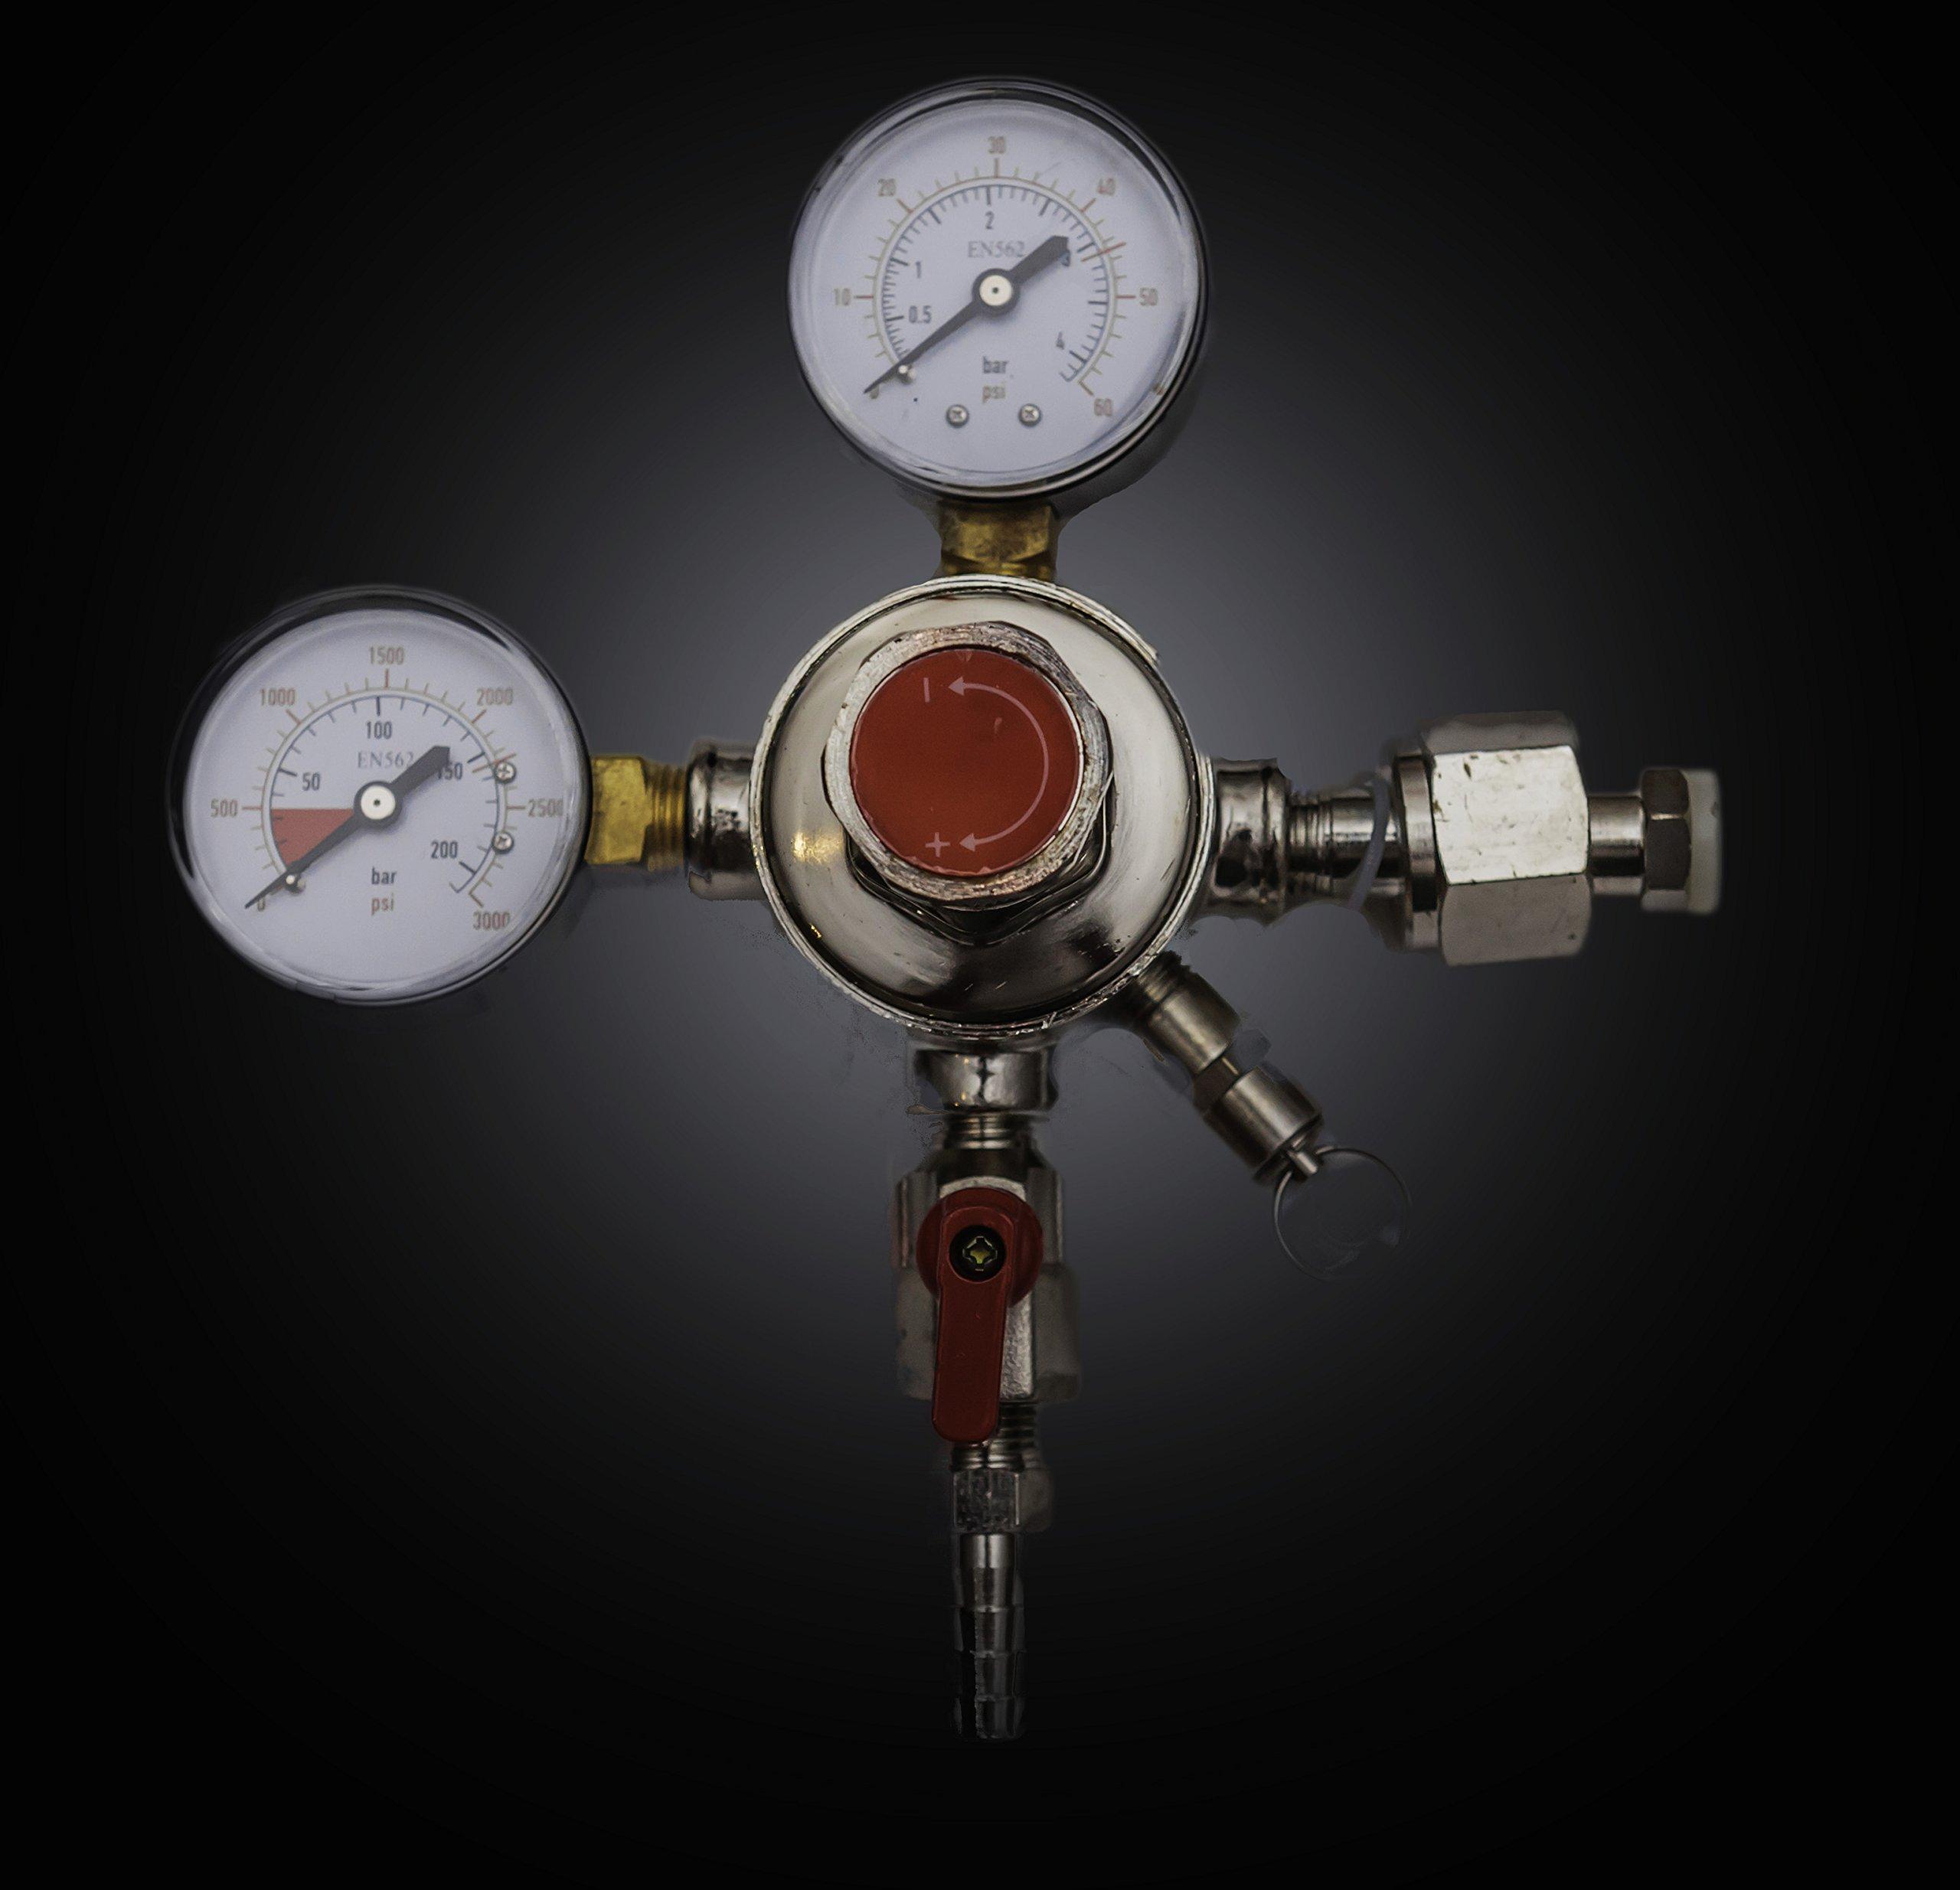 Brewin Dual Gauge Co2 Draft Beer Dispensing Regulator by Brewin